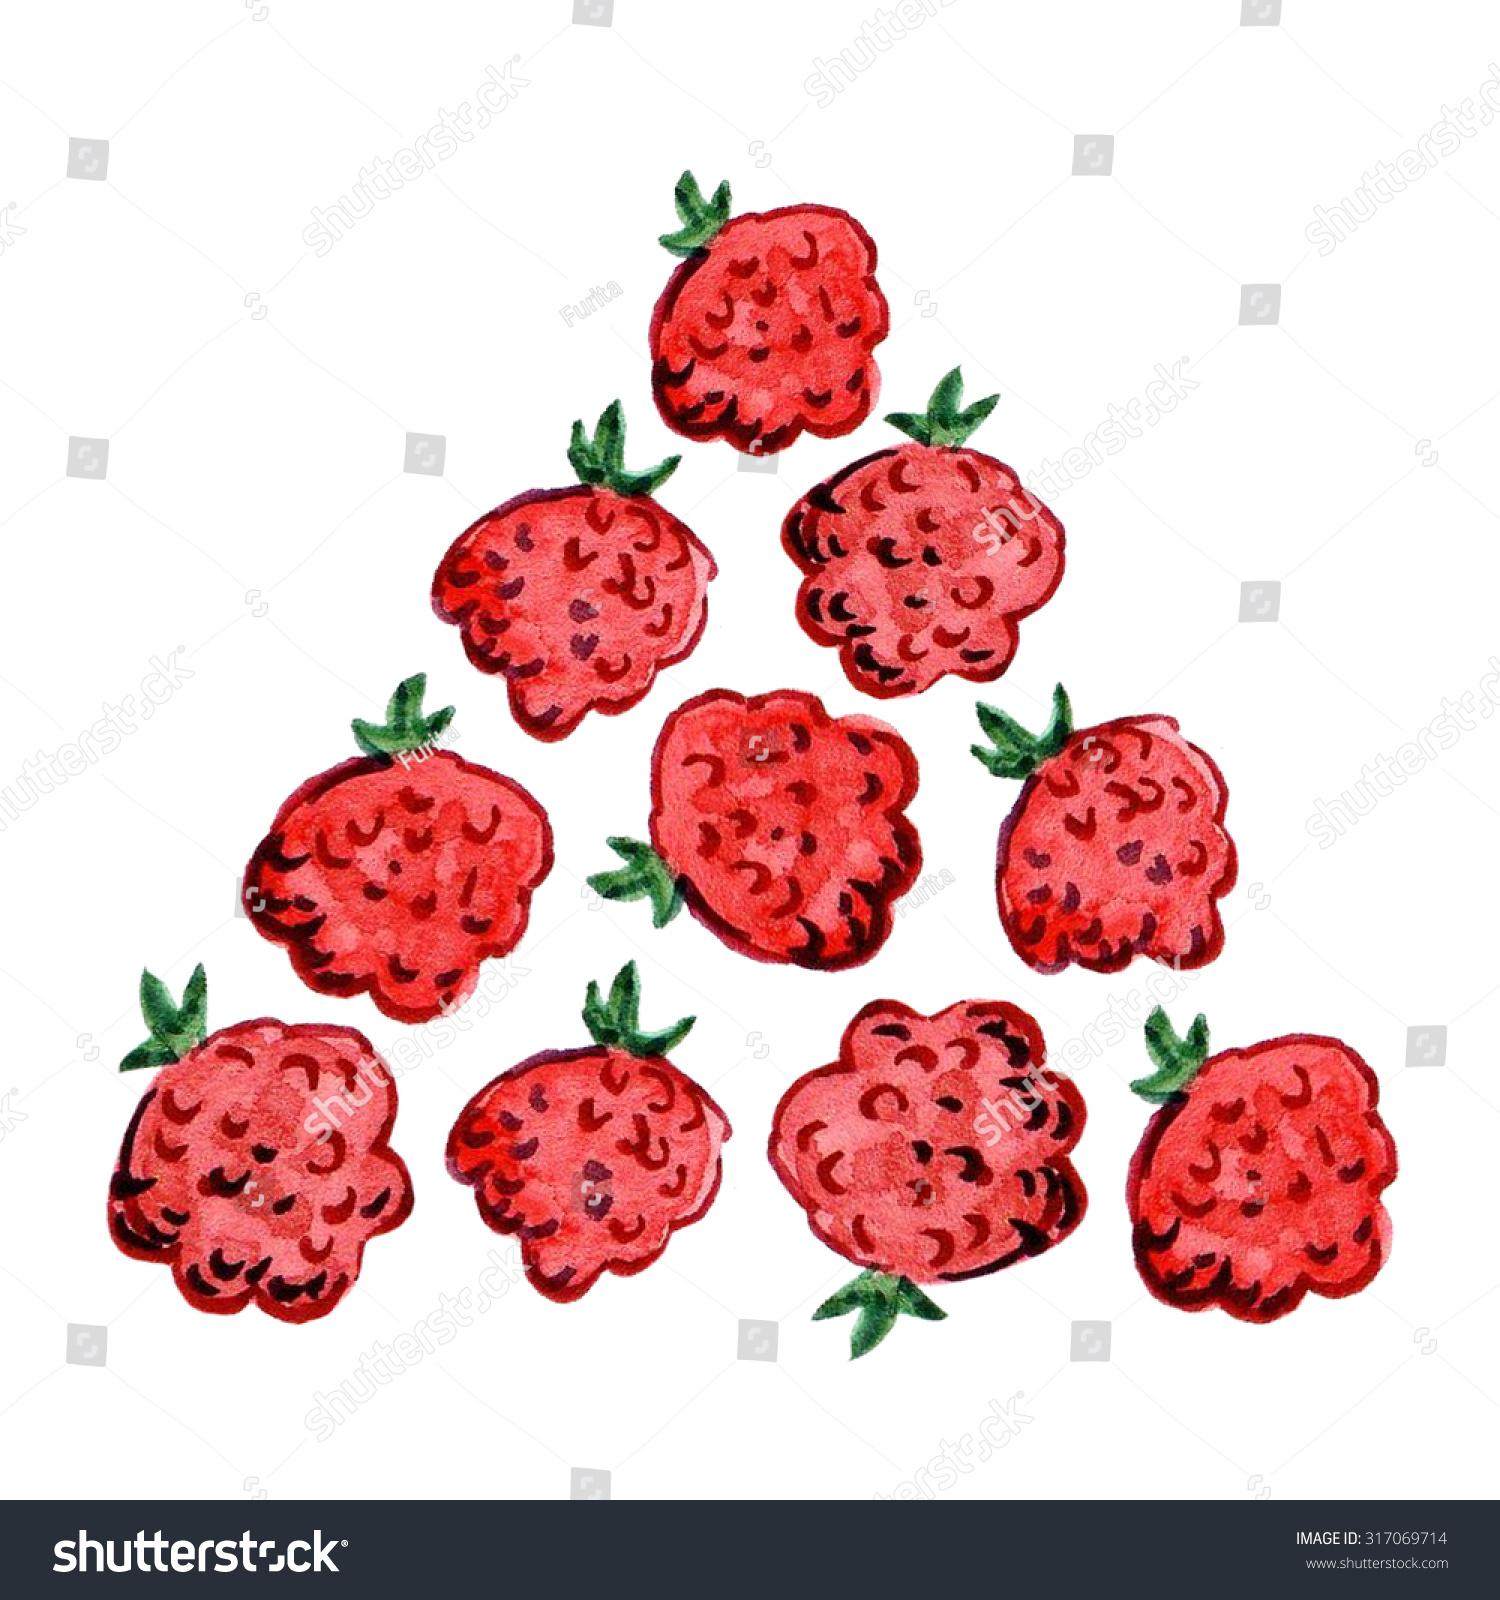 Watercolor Raspberries Elements Greeting Cards Menus Stock